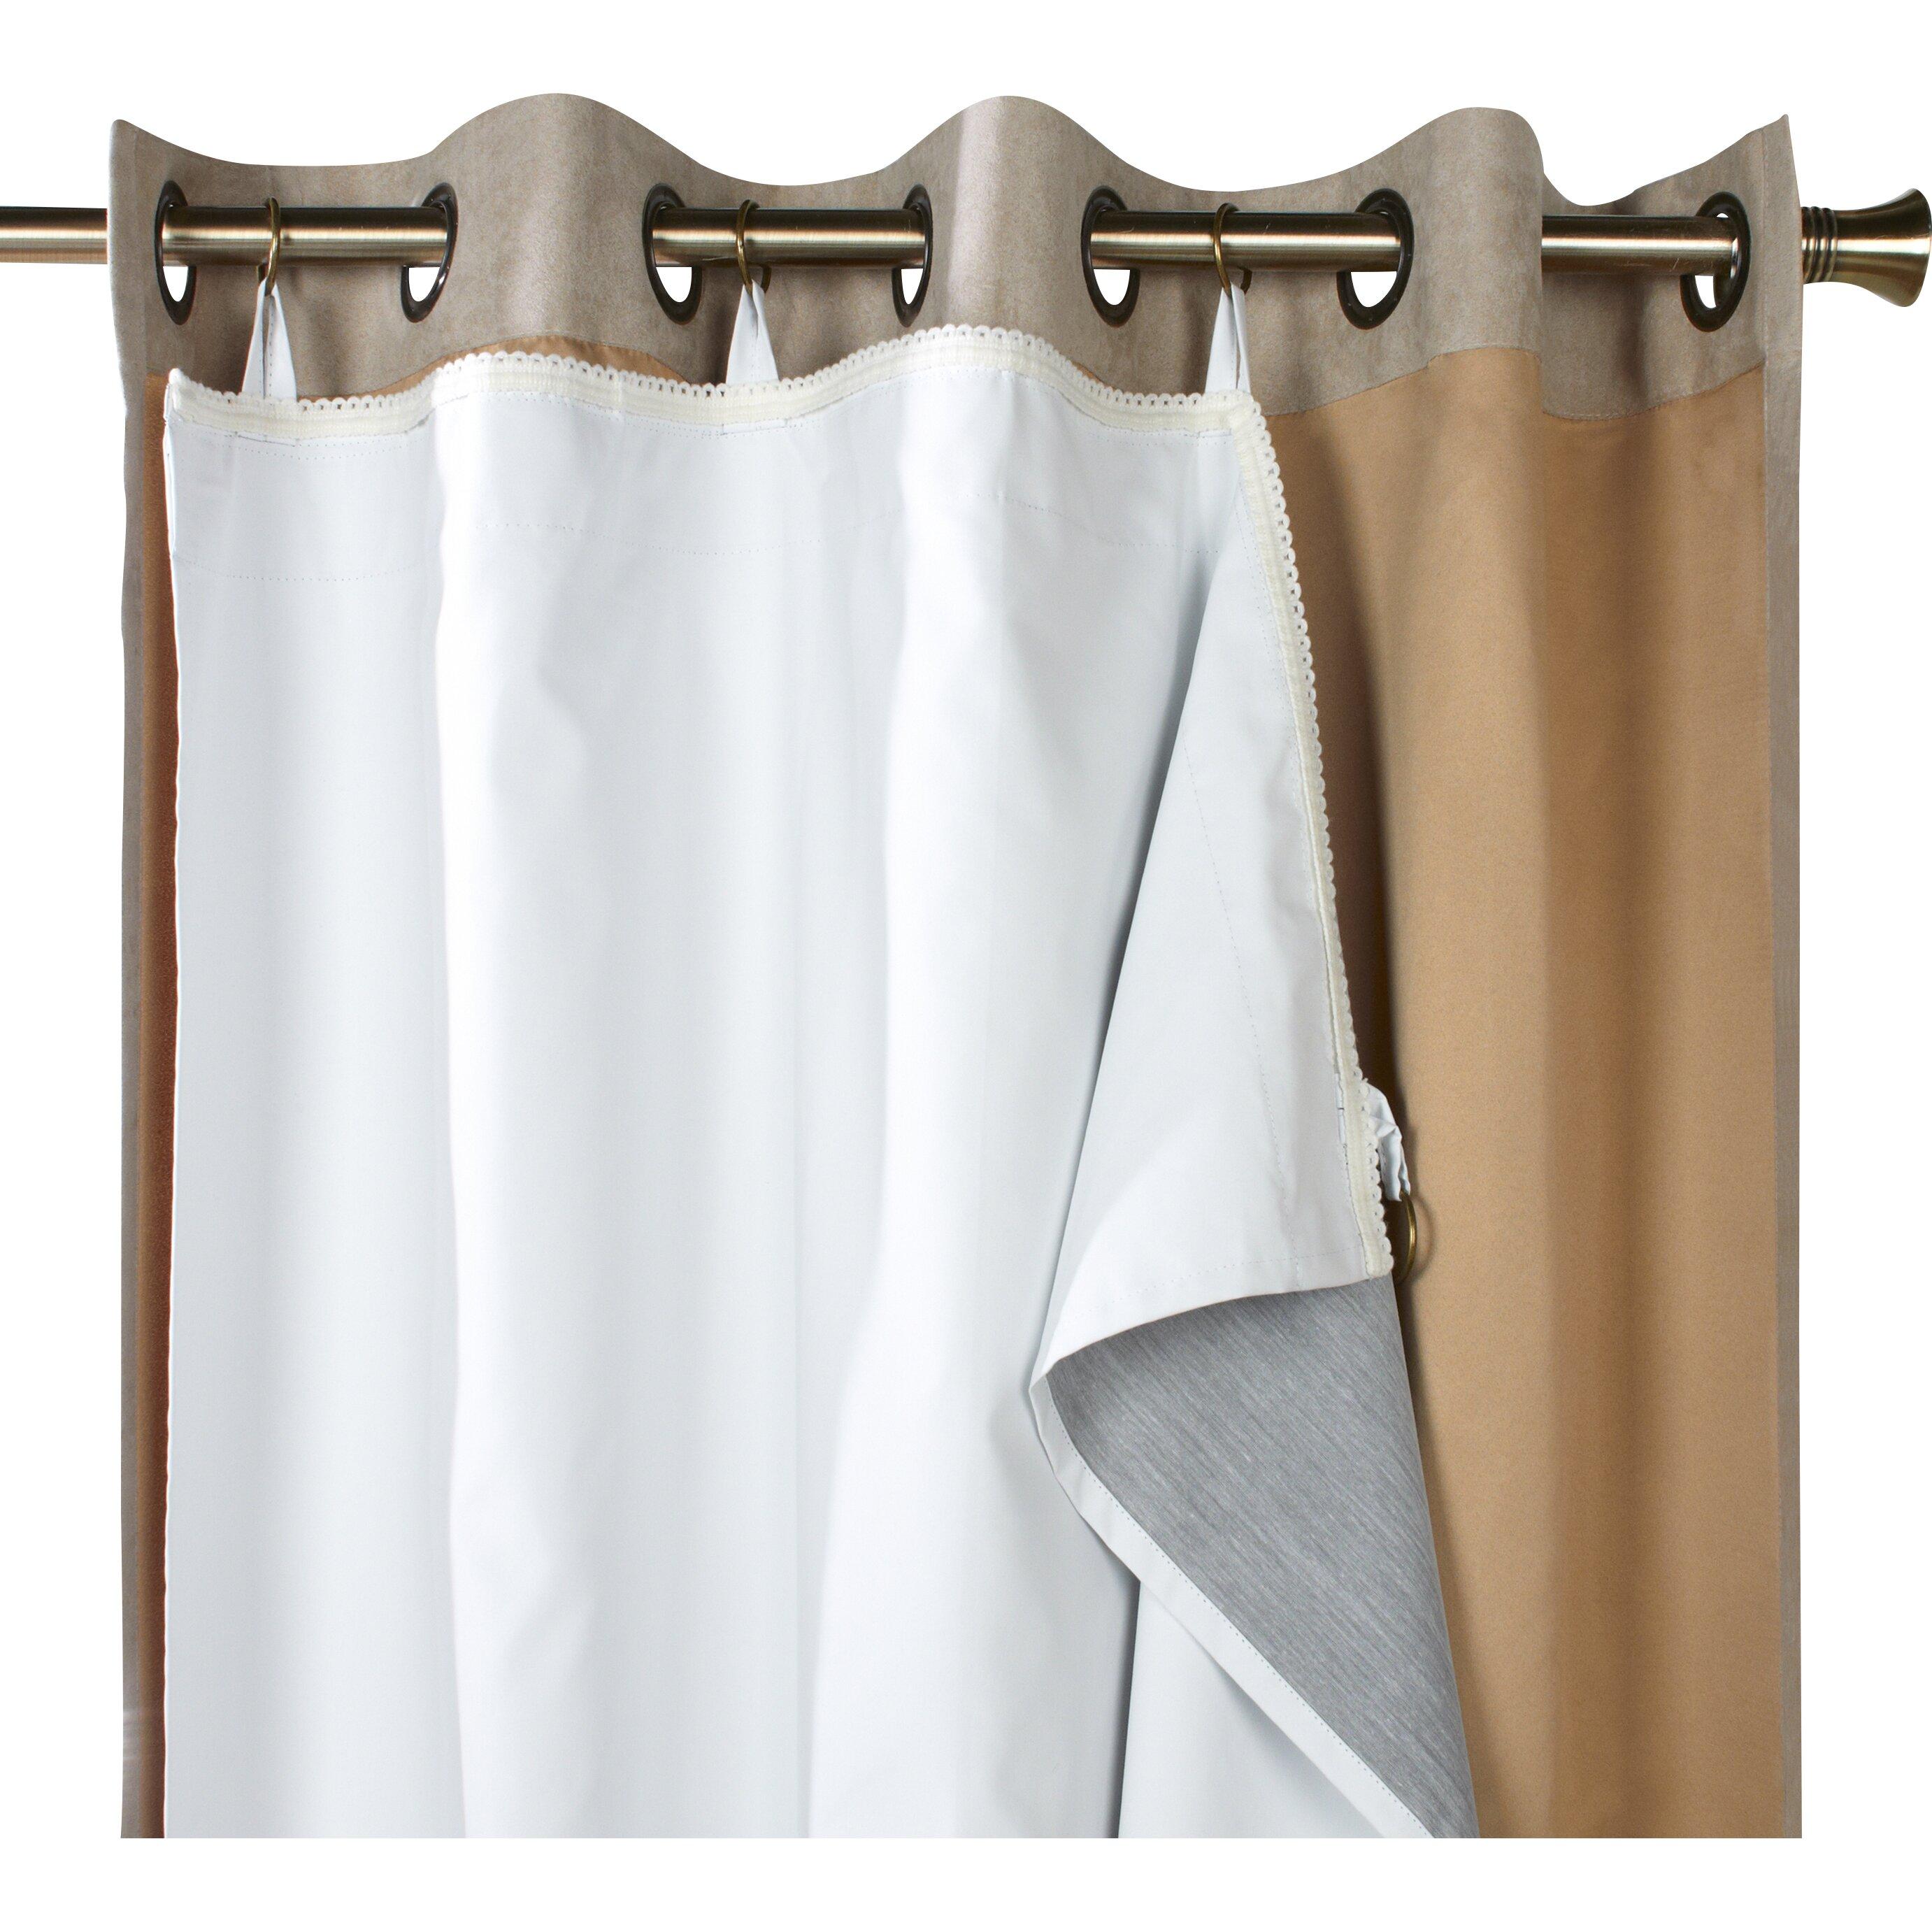 Dorset Single Panel Curtain Liner